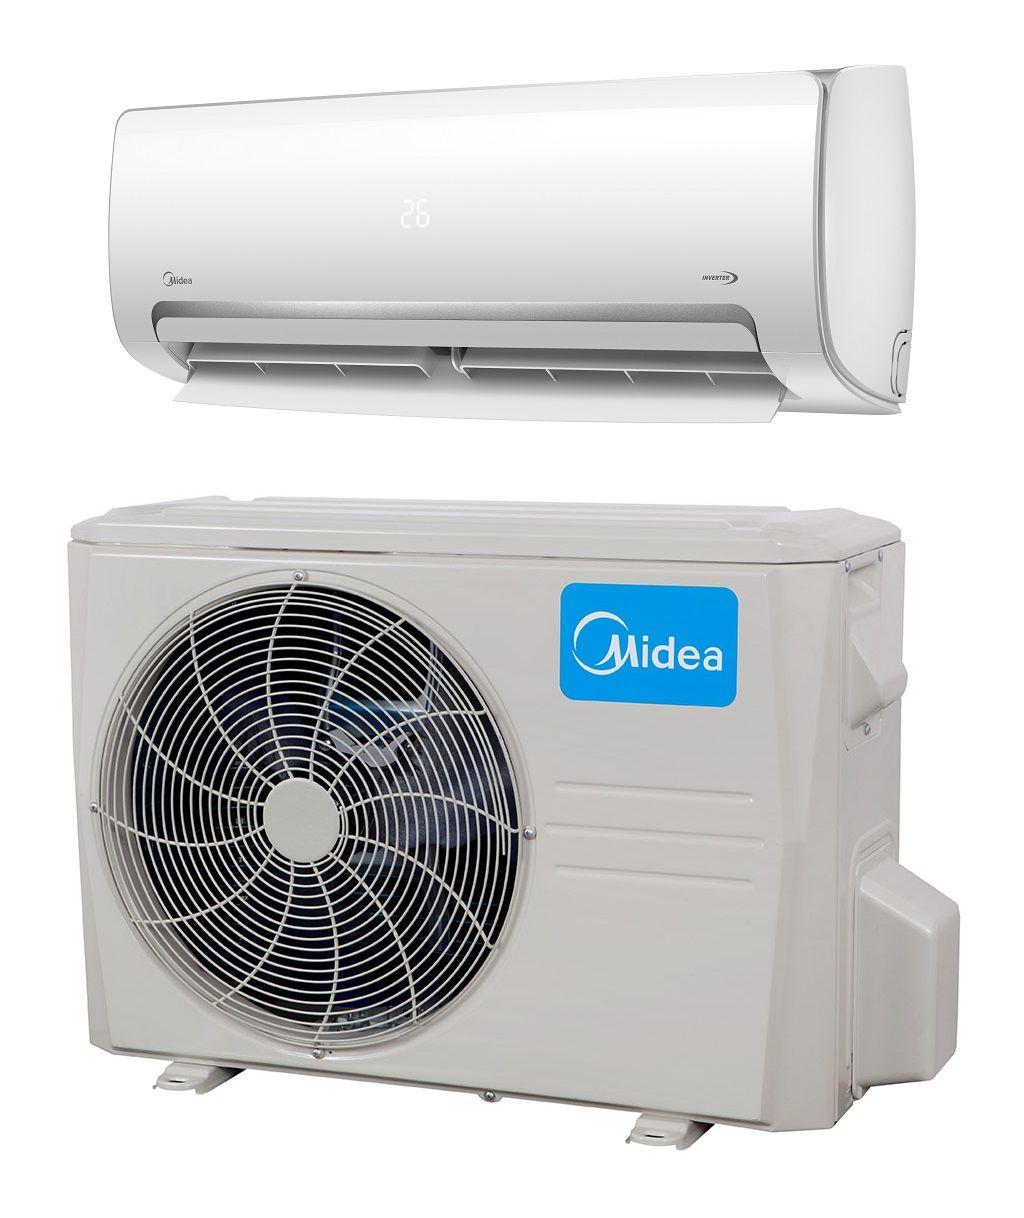 Midea 12000 Btu 110v In Minisplitwarehouse Com Heat Pump Air